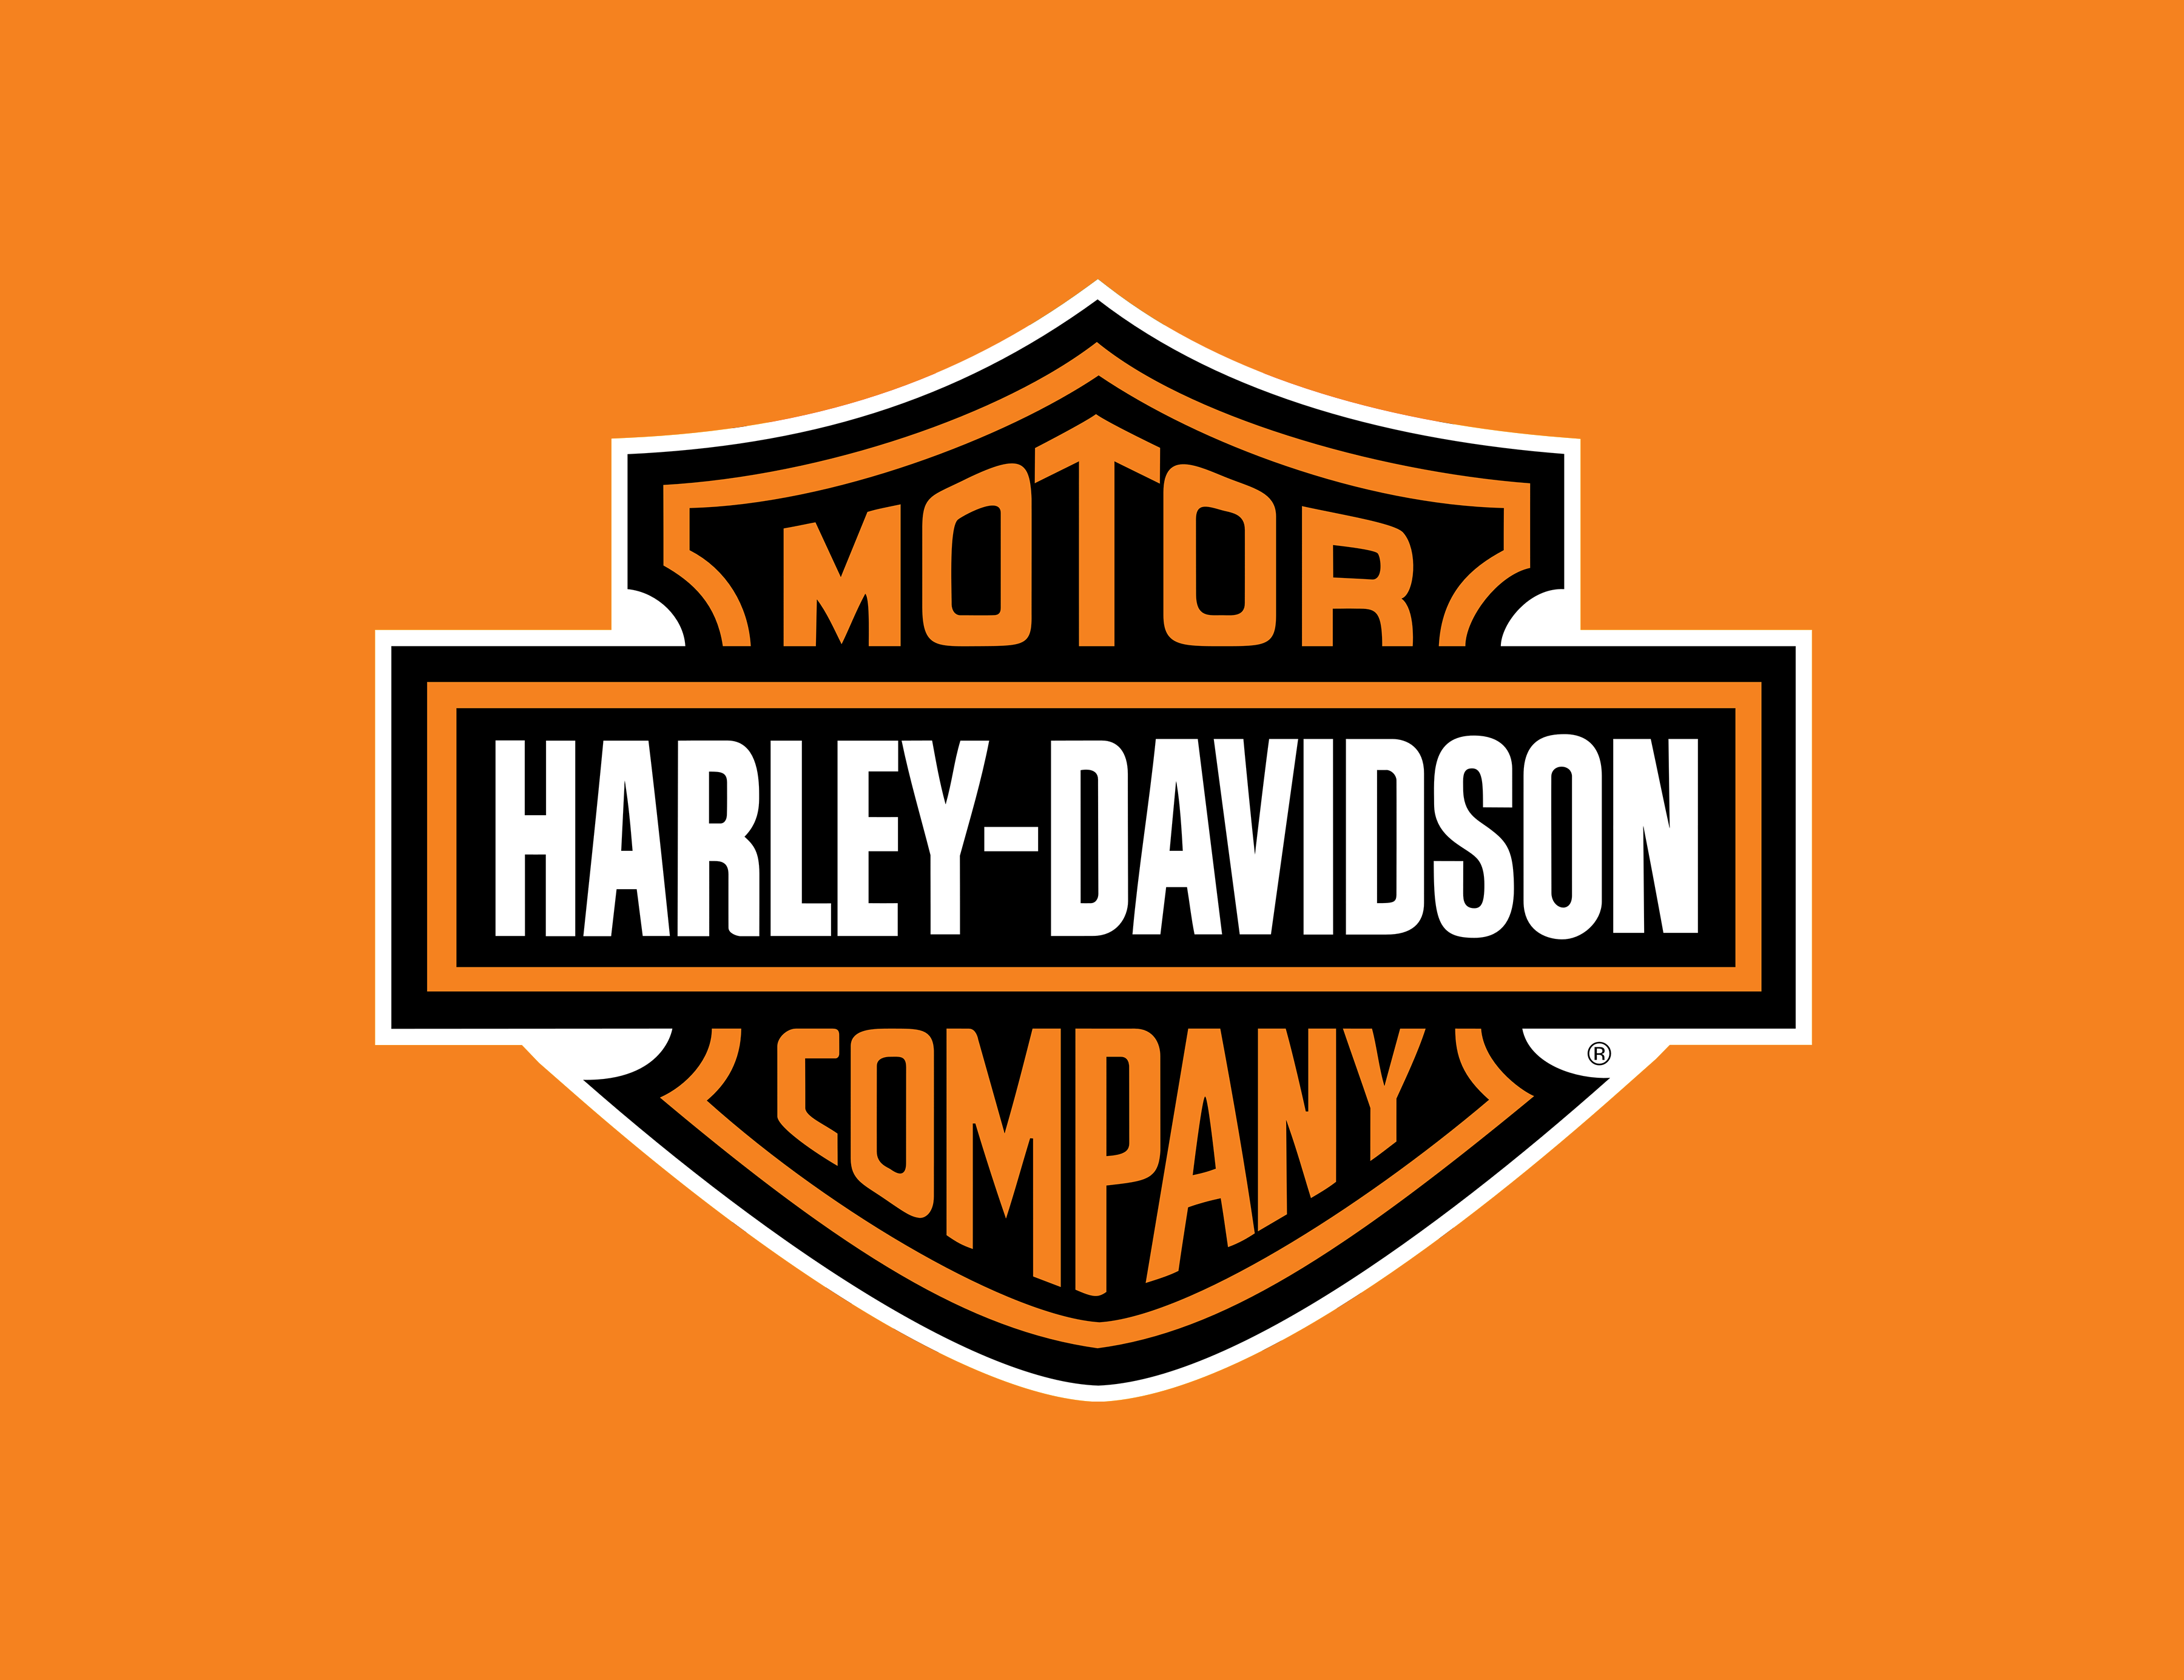 Harley Davidson Fondo De Pantalla Hd Fondo De Escritorio